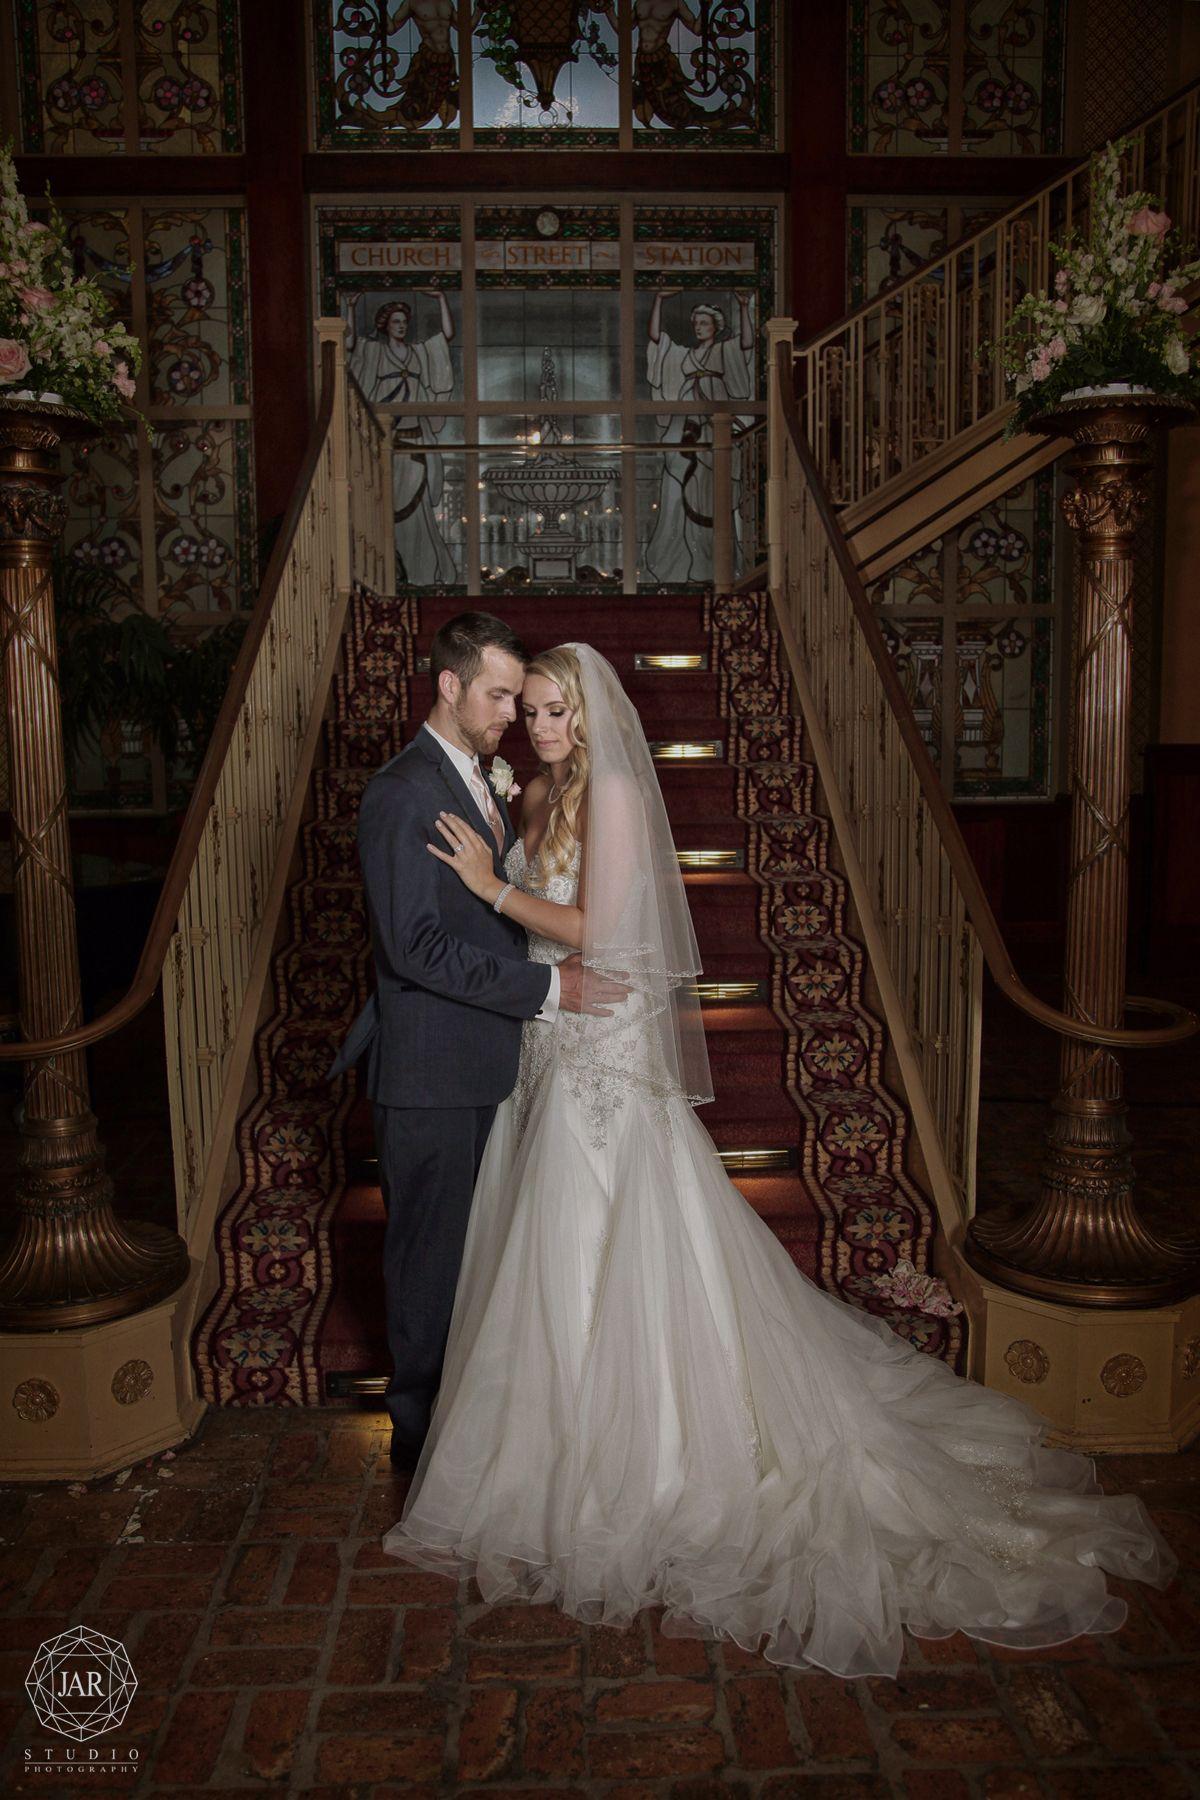 Ipw Reception Corporate Event Photographyorlando Wedding: PHOTOGRAPHY On Weddings At The